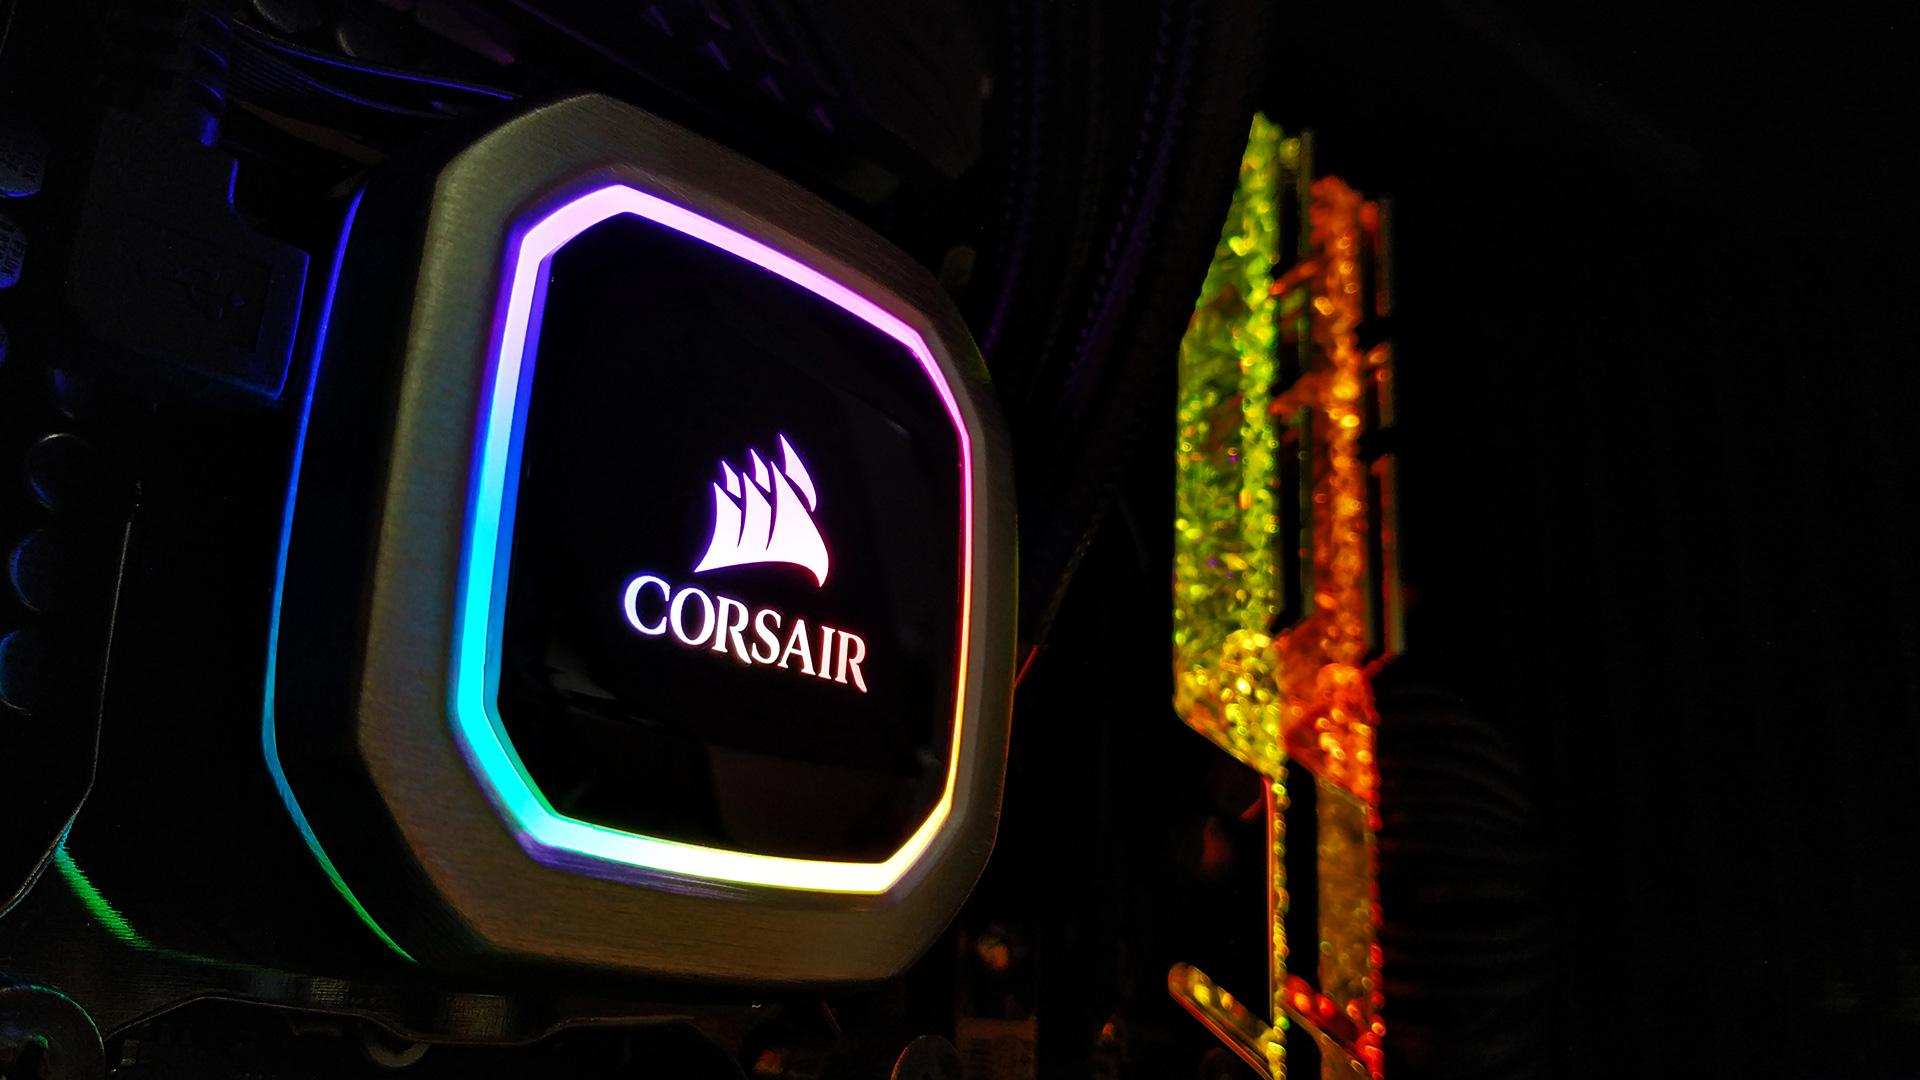 Corsair H115i RGB Platinoa hozteko sistemaren proba